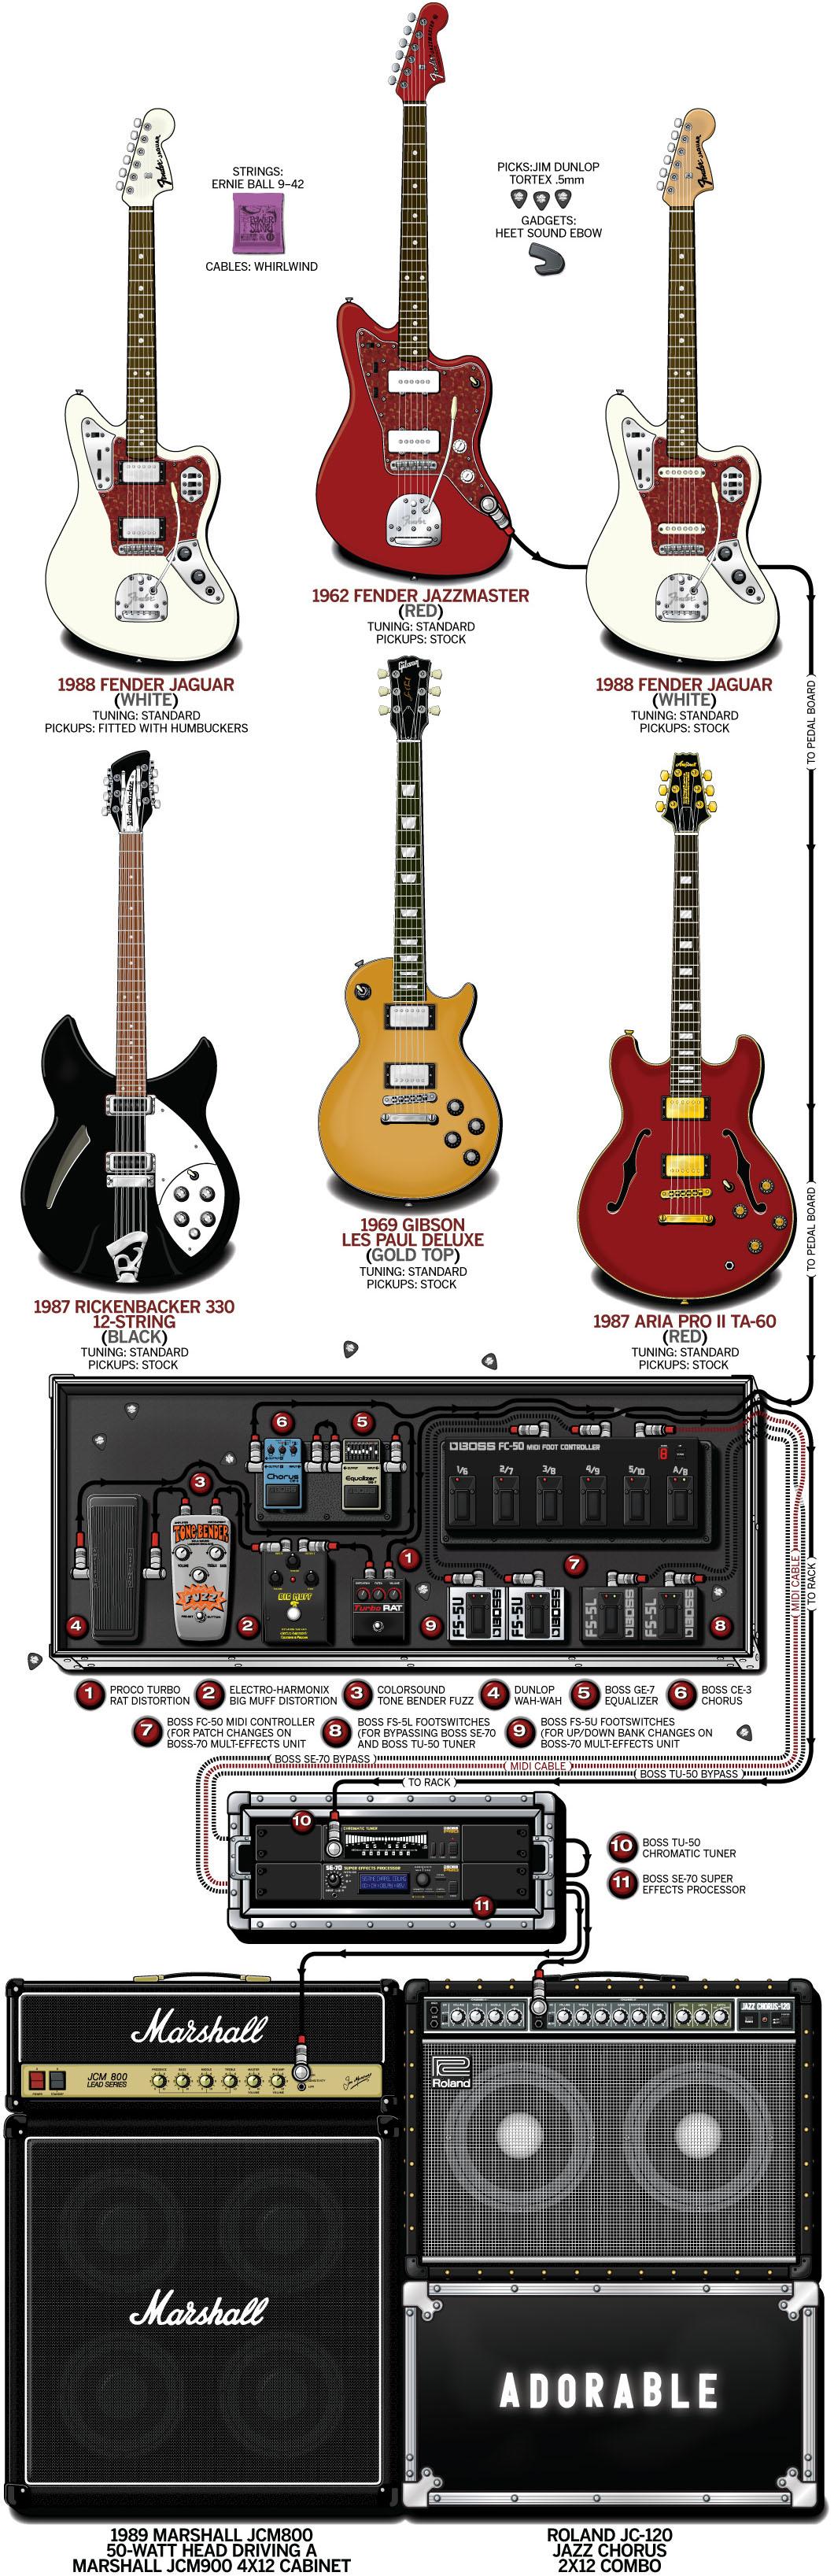 Robert Dillam Guitar Gear & Rig – Adorable – 1993